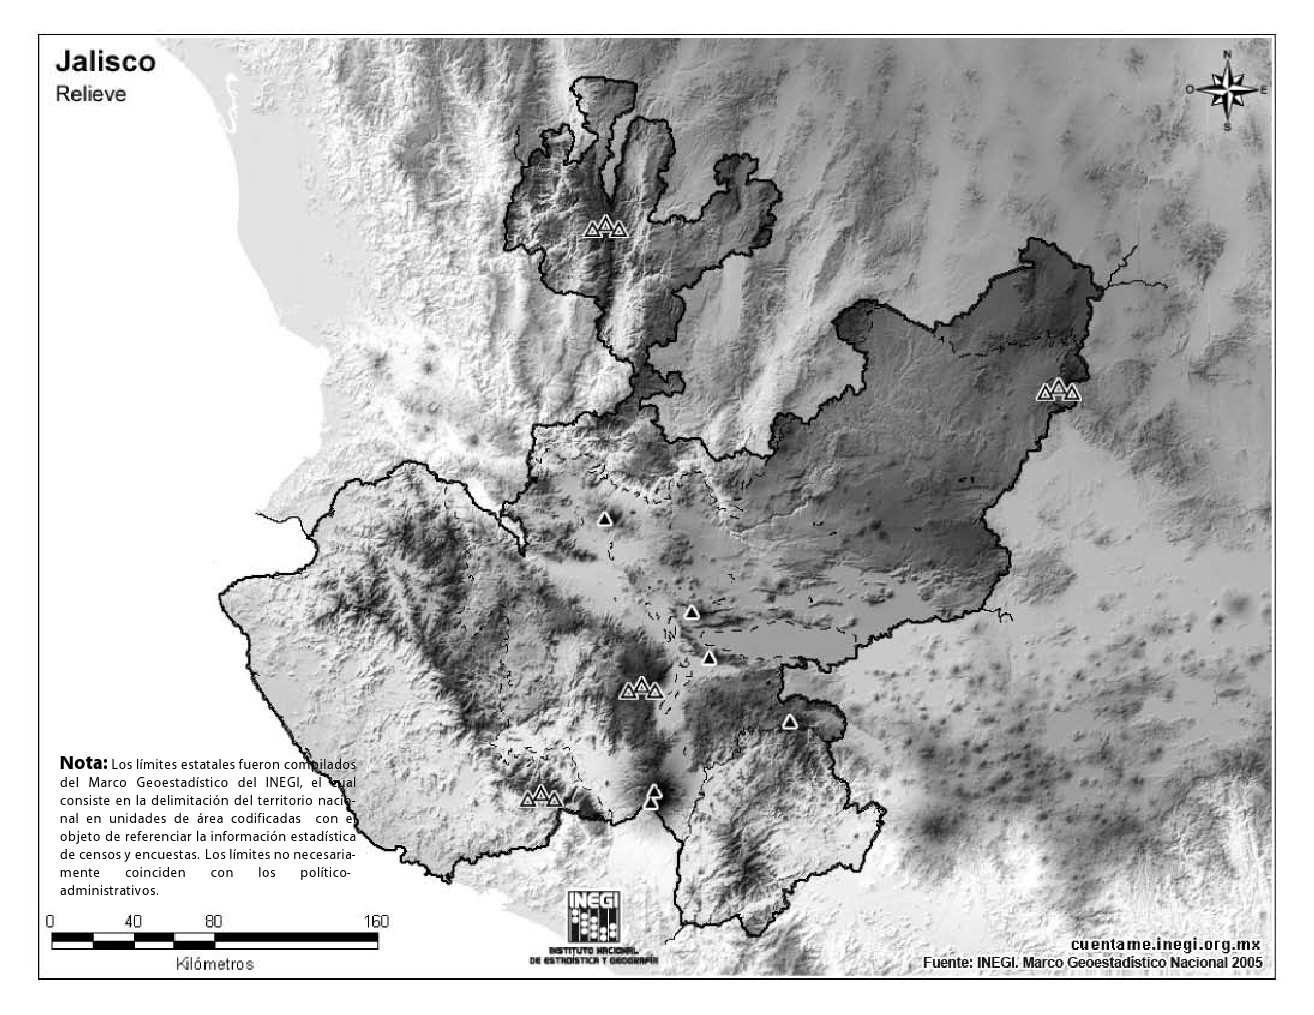 Mapa mudo de montañas de Jalisco. INEGI de México